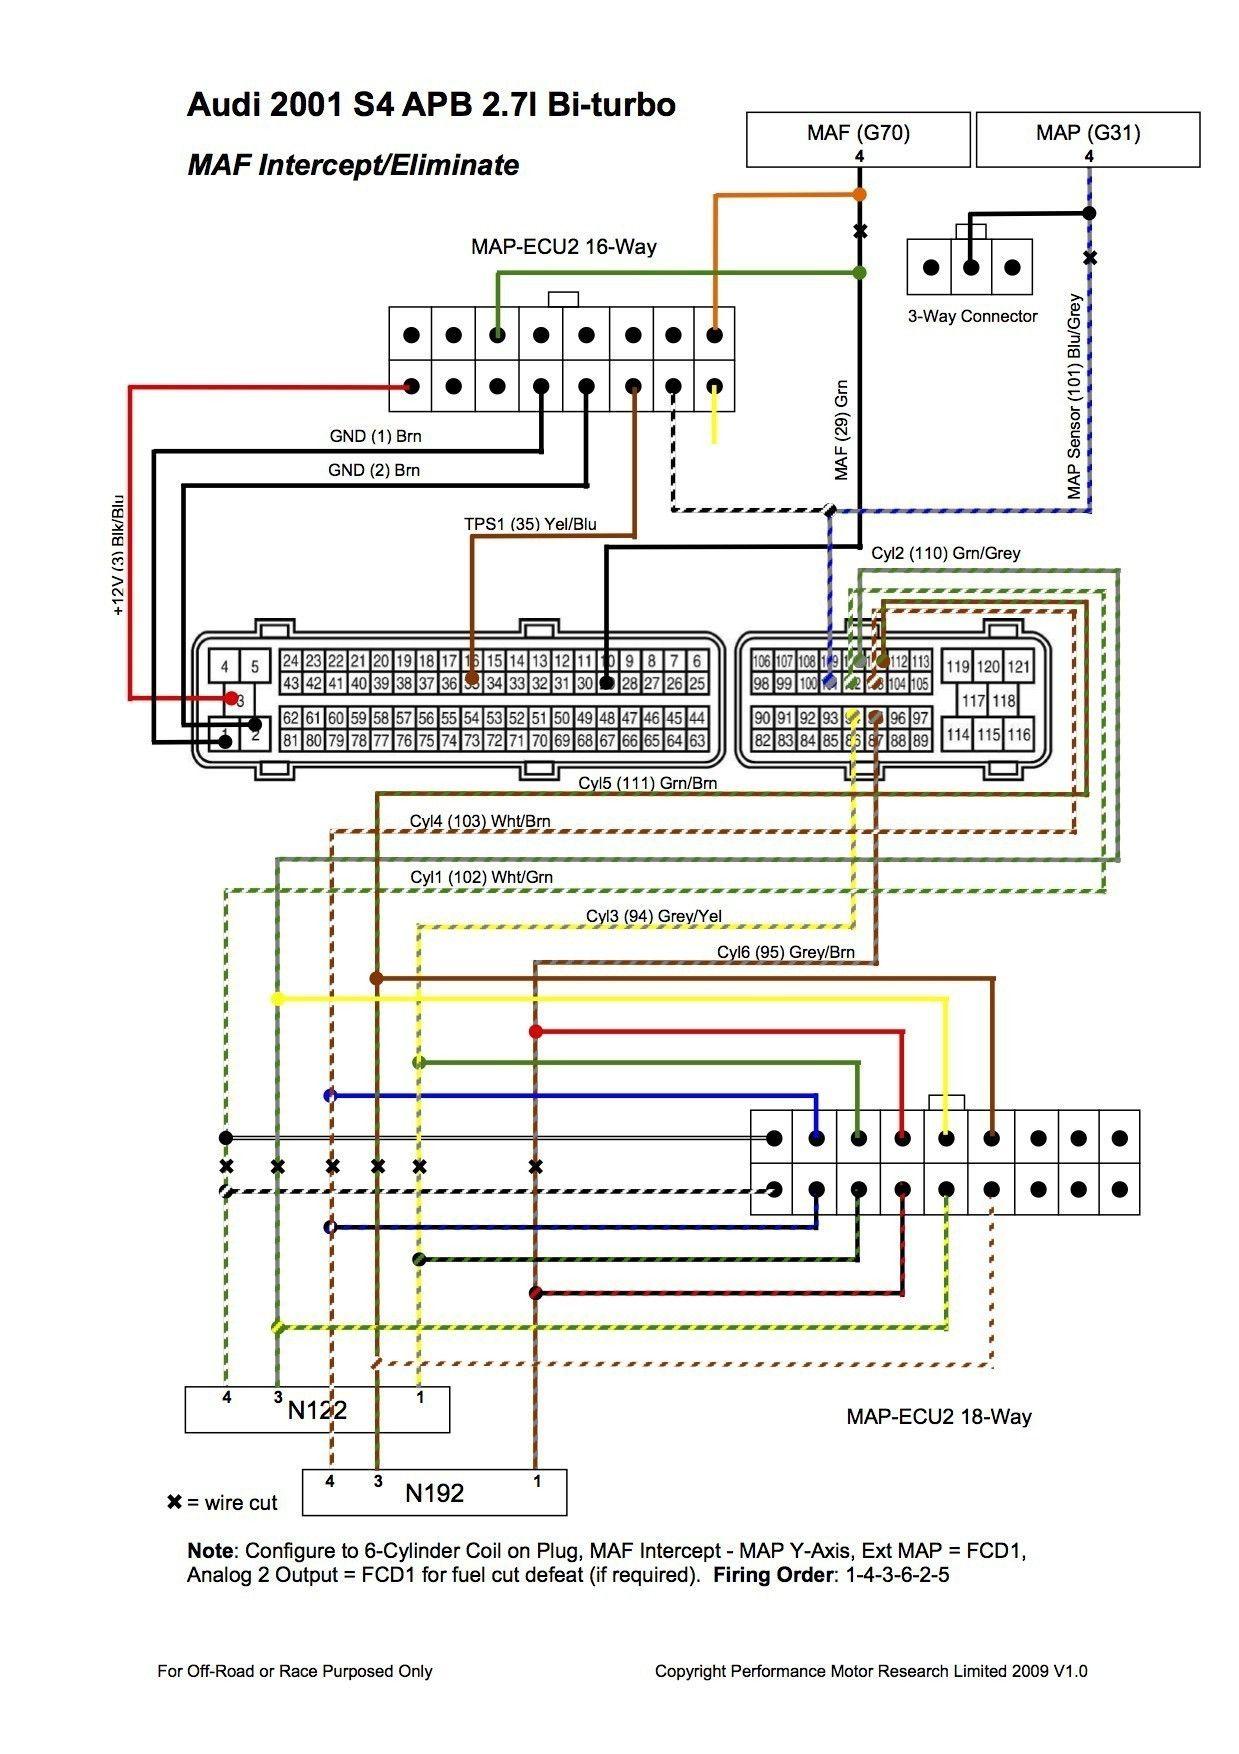 Toyota Jbl Amplifier Wiring Diagram Http Bookingritzcarlton Info Toyota Jbl Amplifier Wiring Diag Trailer Wiring Diagram Electrical Wiring Diagram Dodge Ram